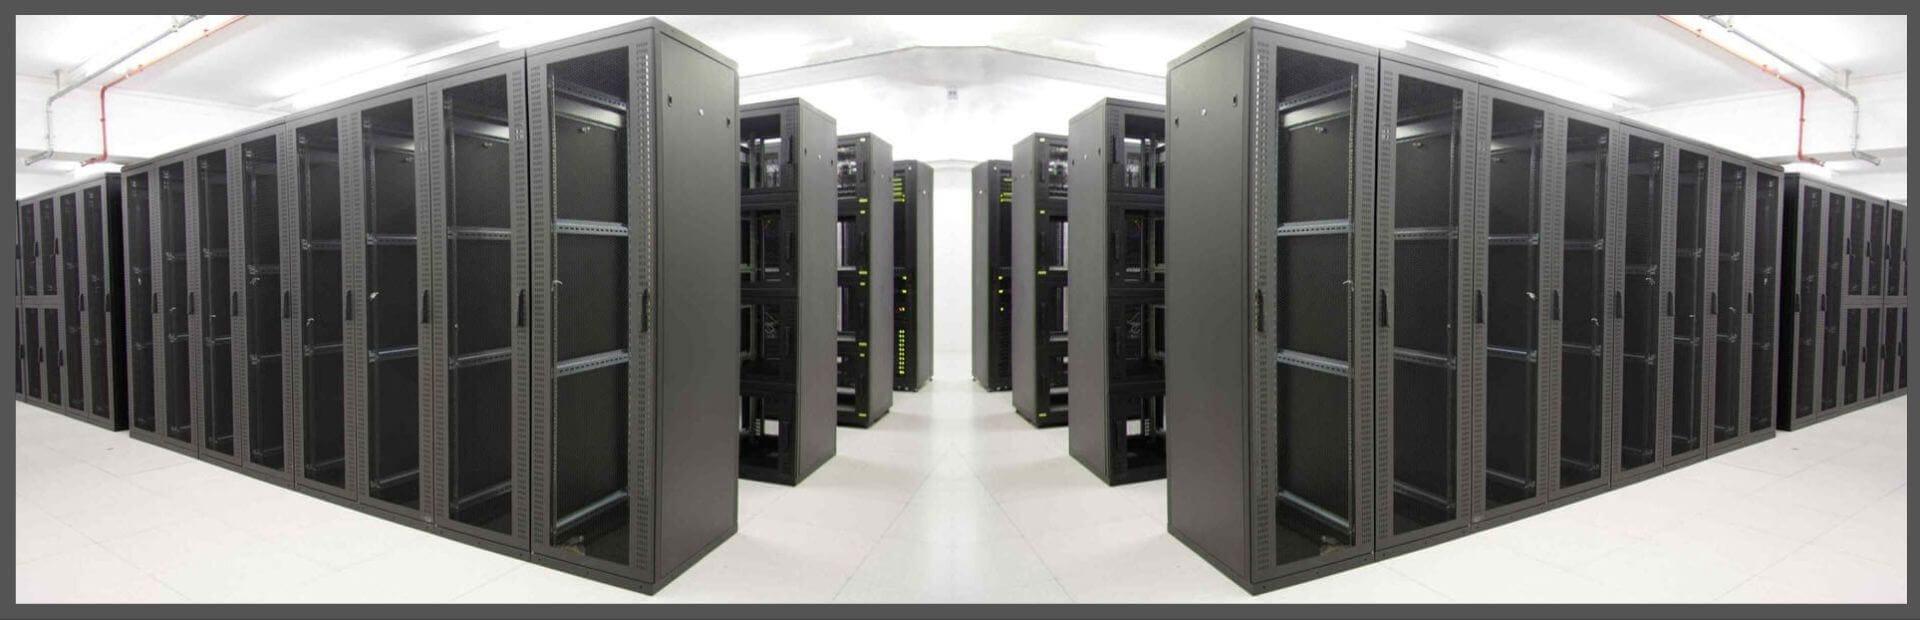 data center india image